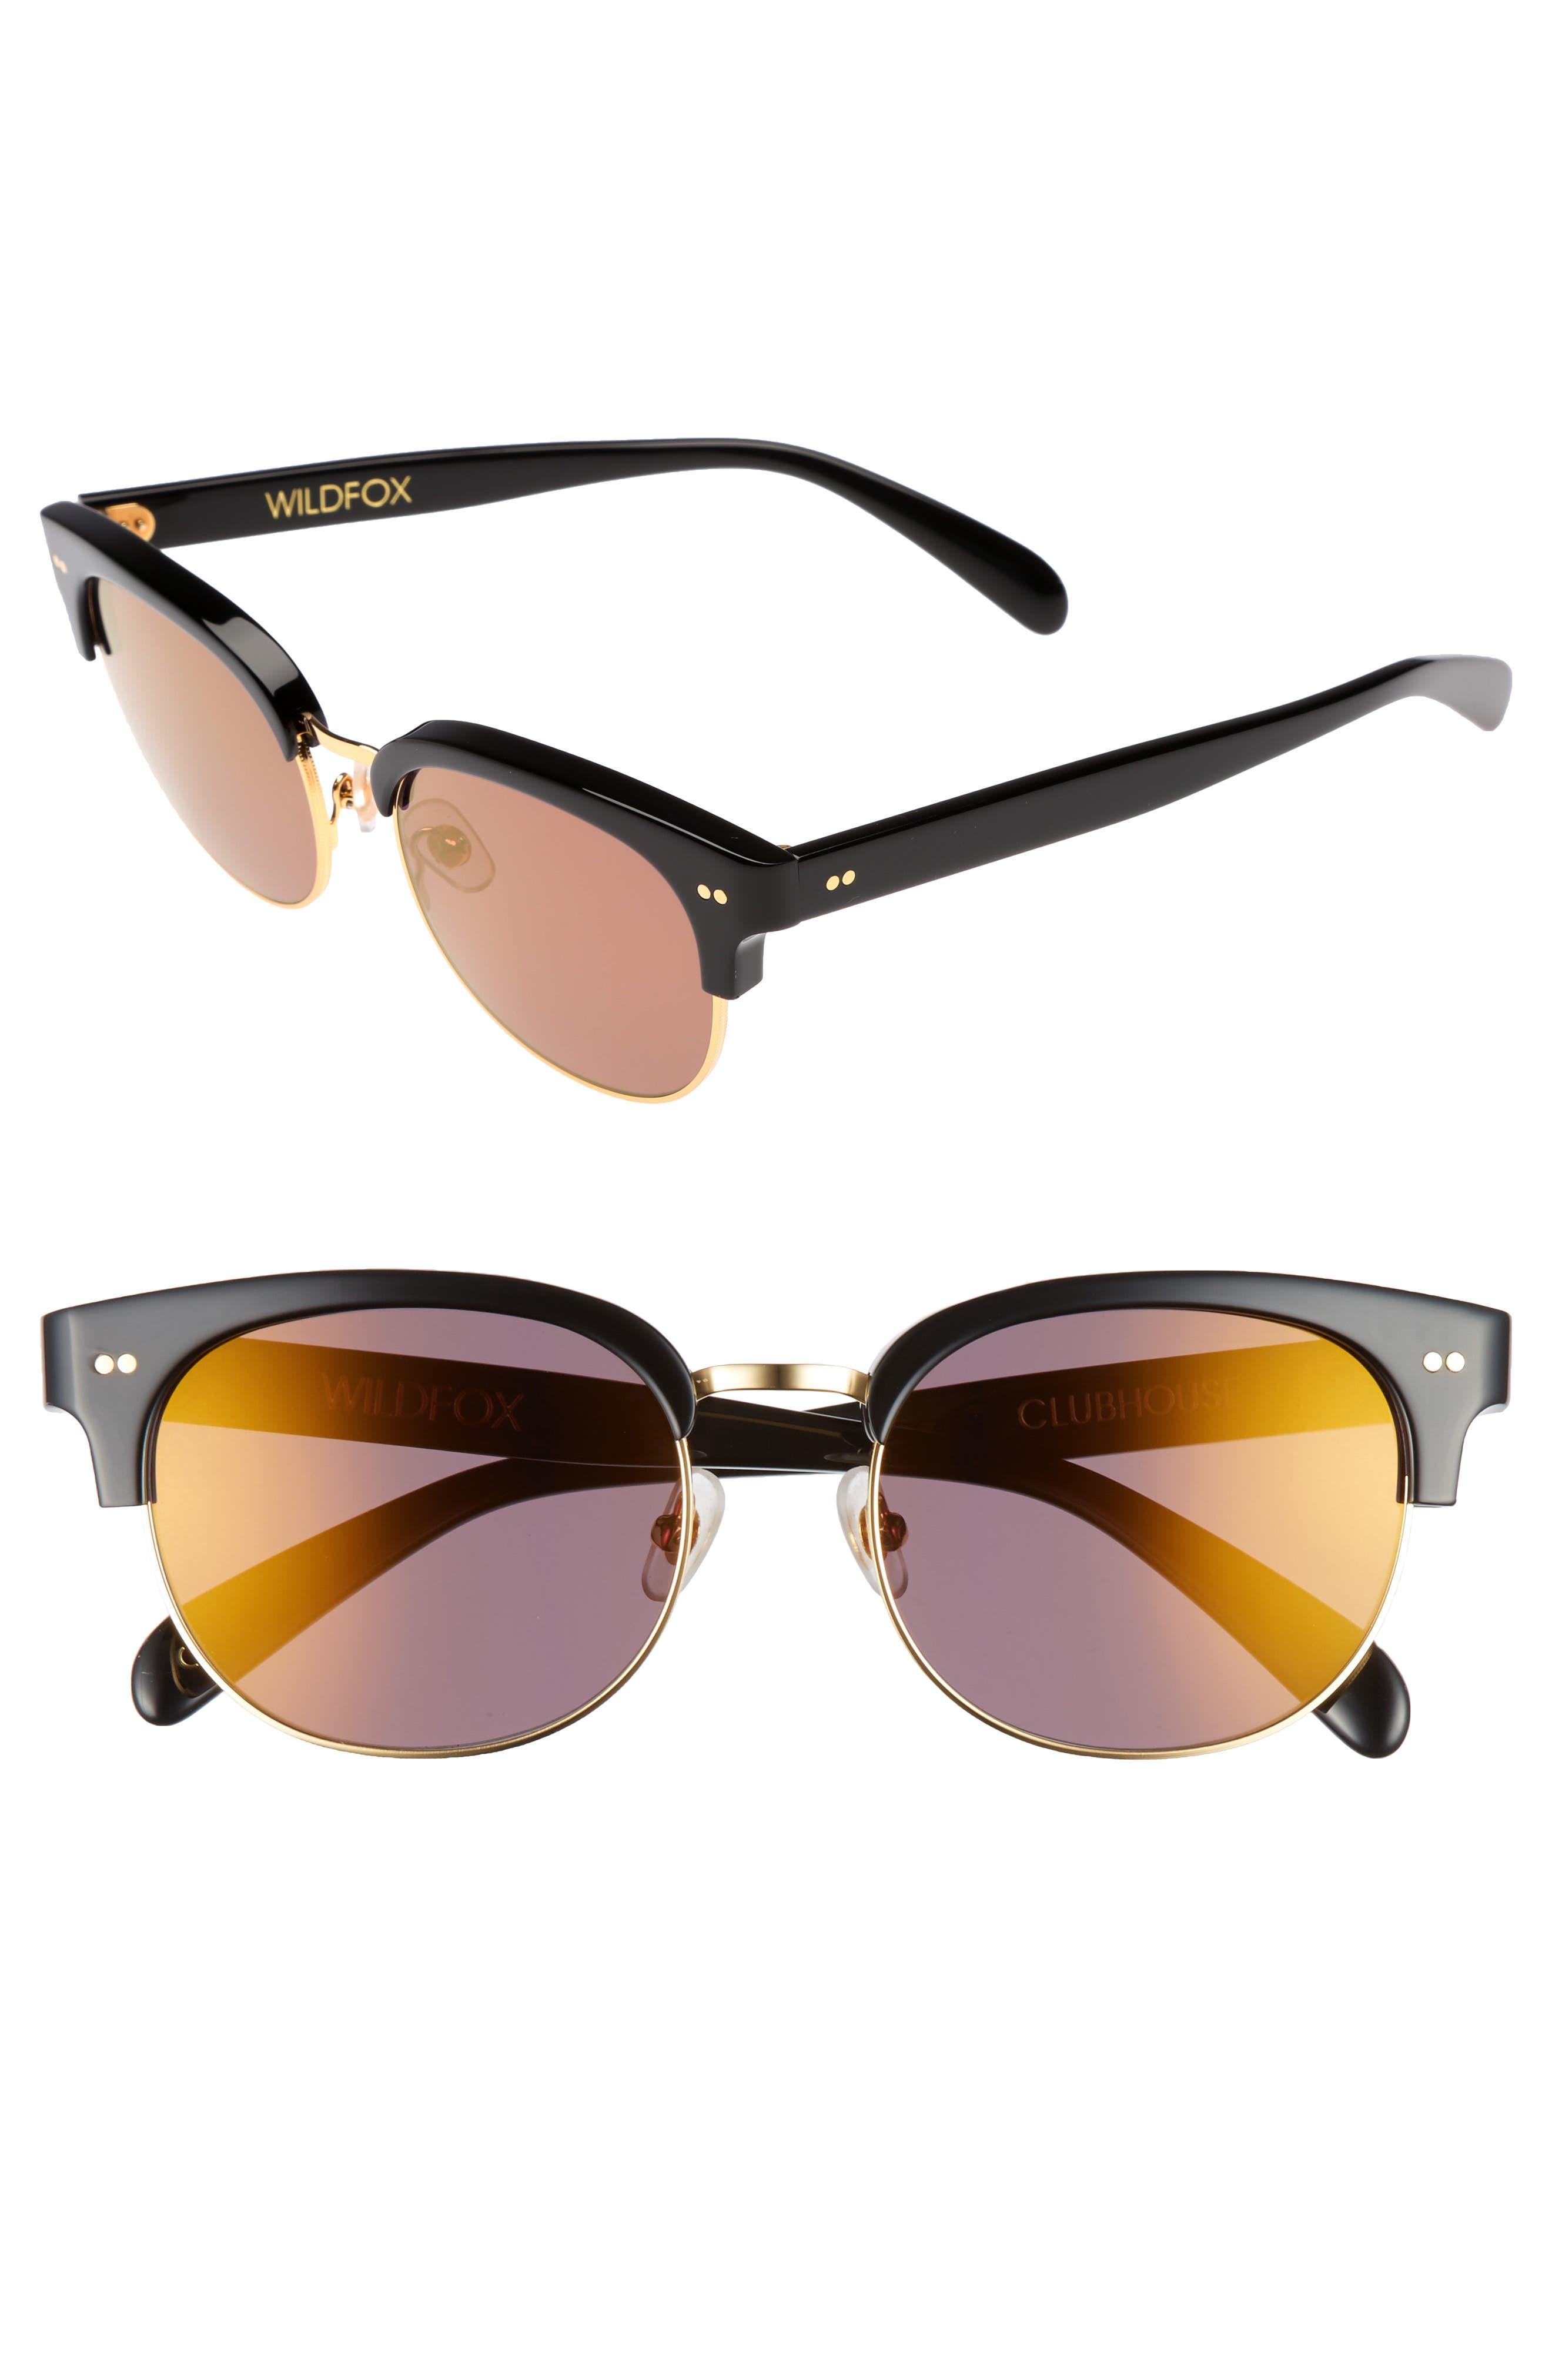 WILDFOX, Clubhouse 50mm Semi-Rimless Sunglasses, Main thumbnail 1, color, BLACK/ GOLD